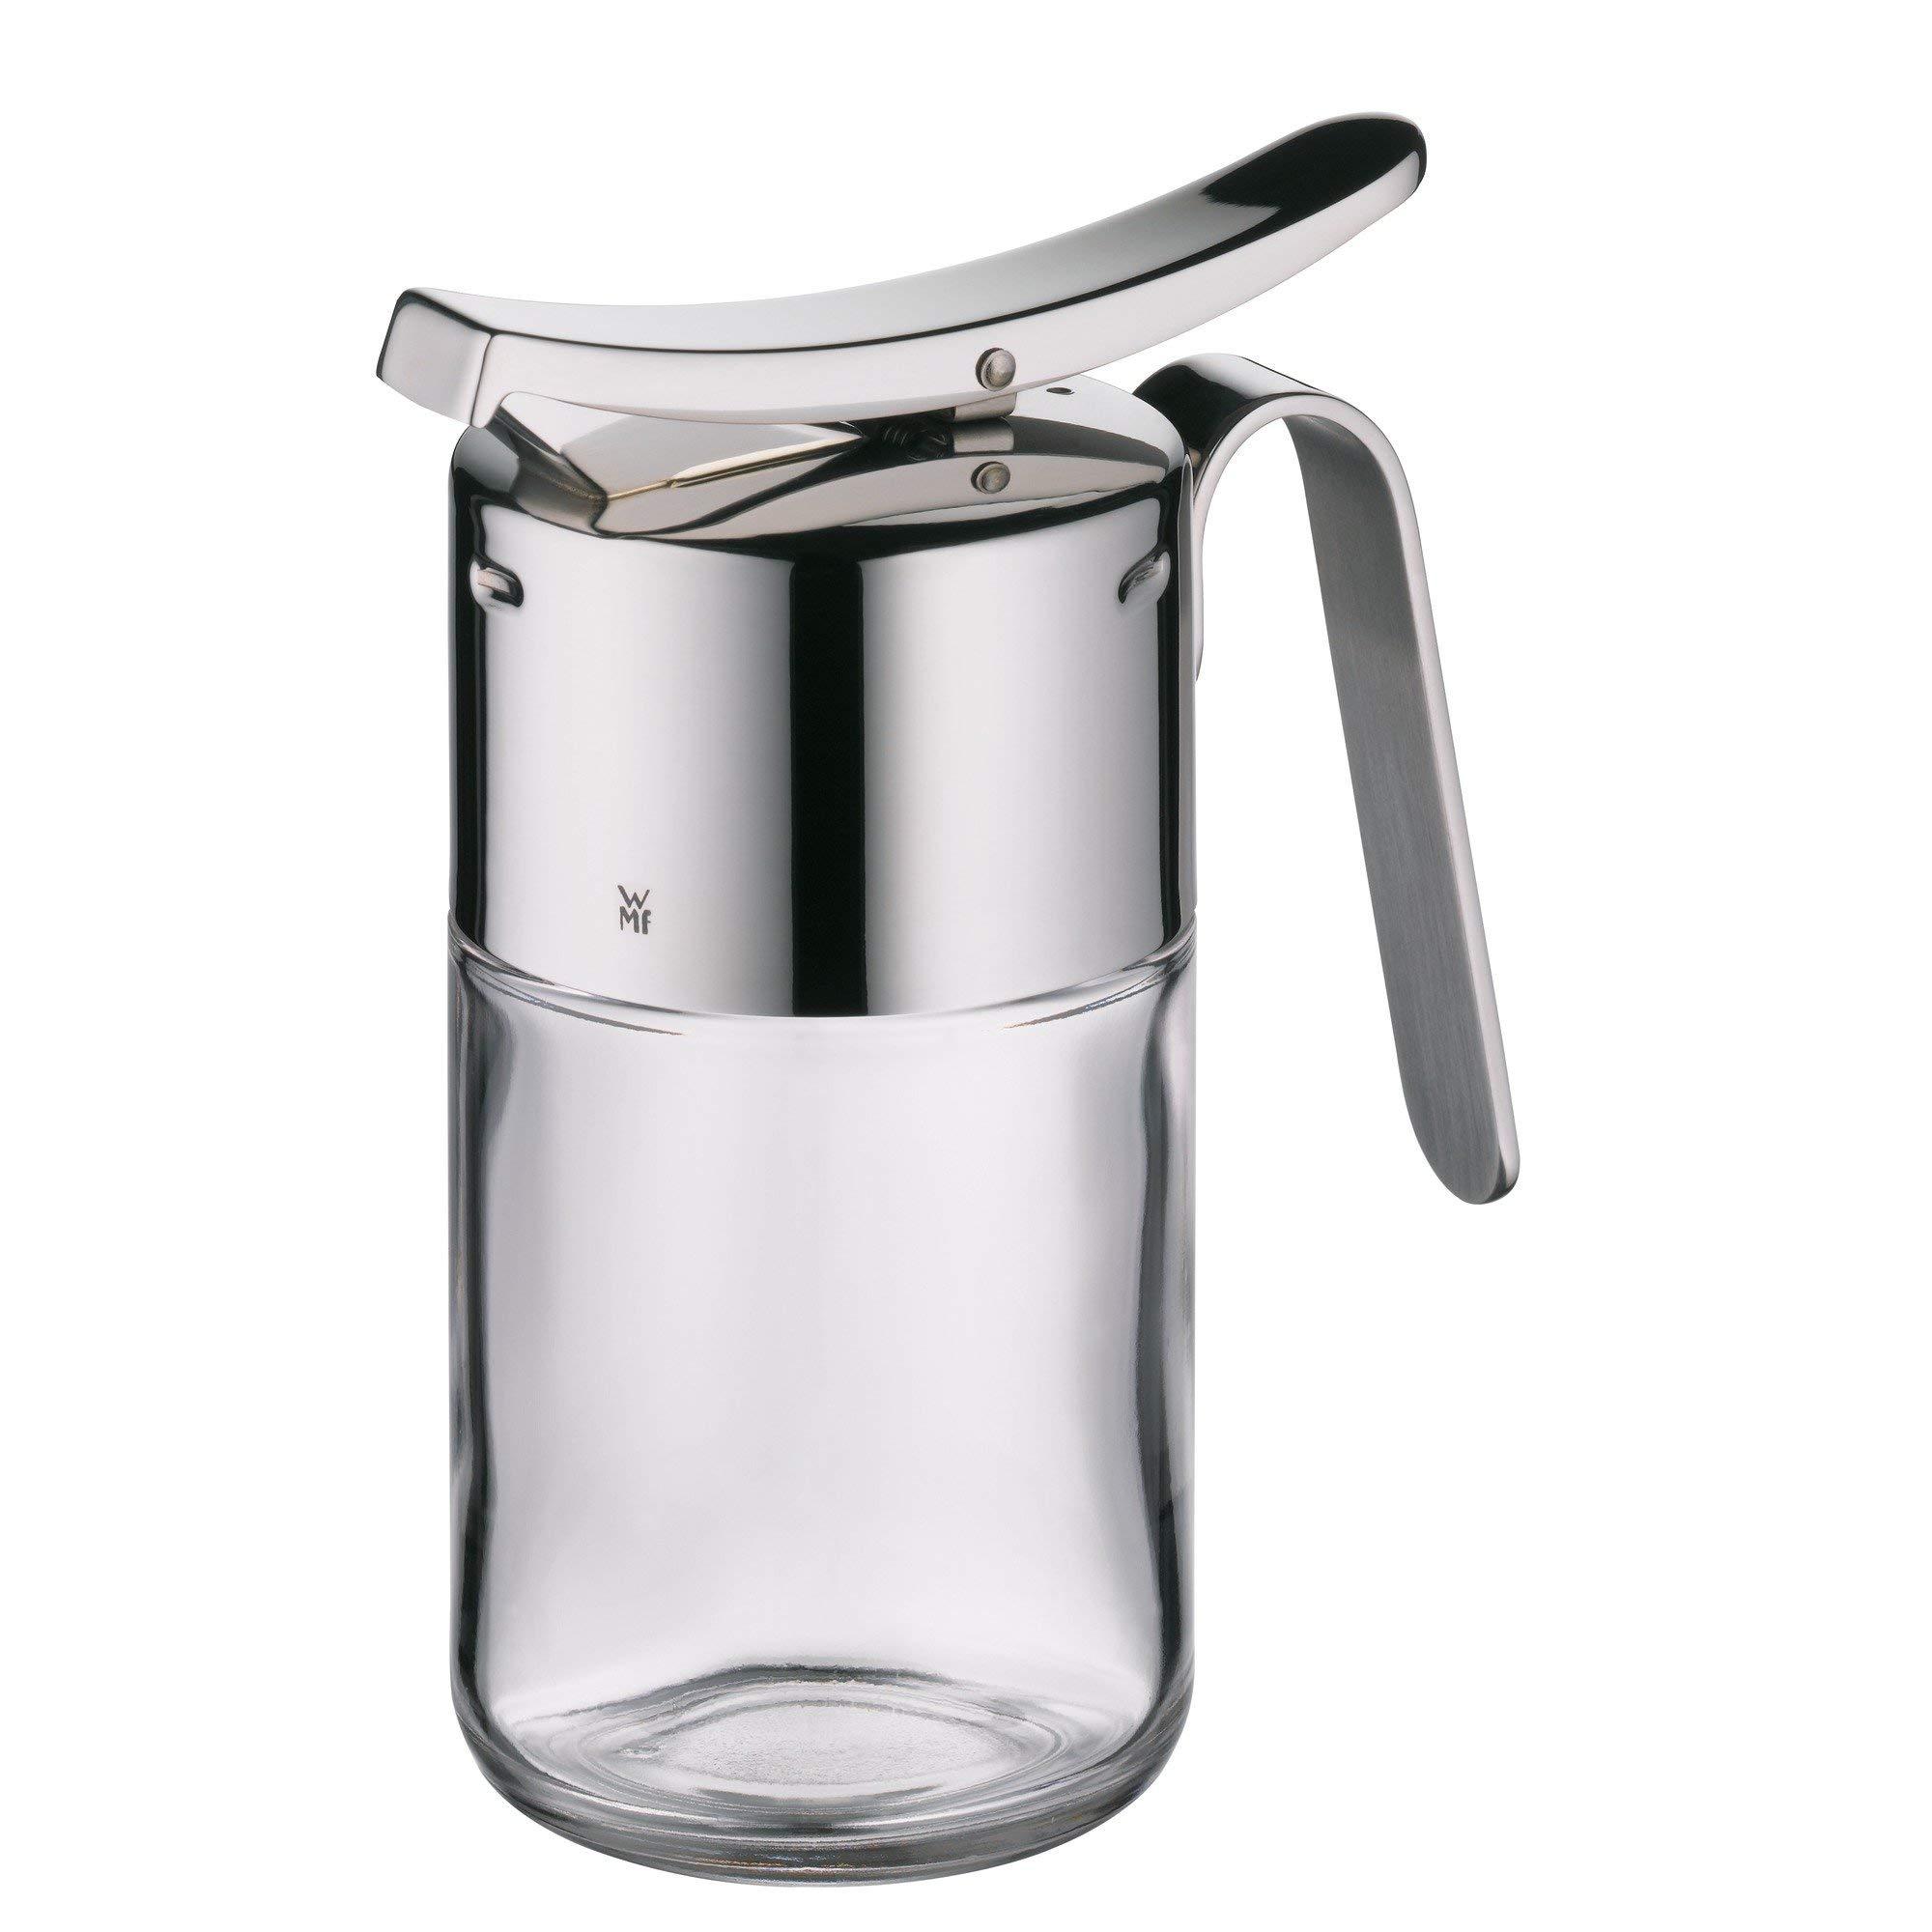 WMF Barista 636646040 Honey/Syrup Dispenser